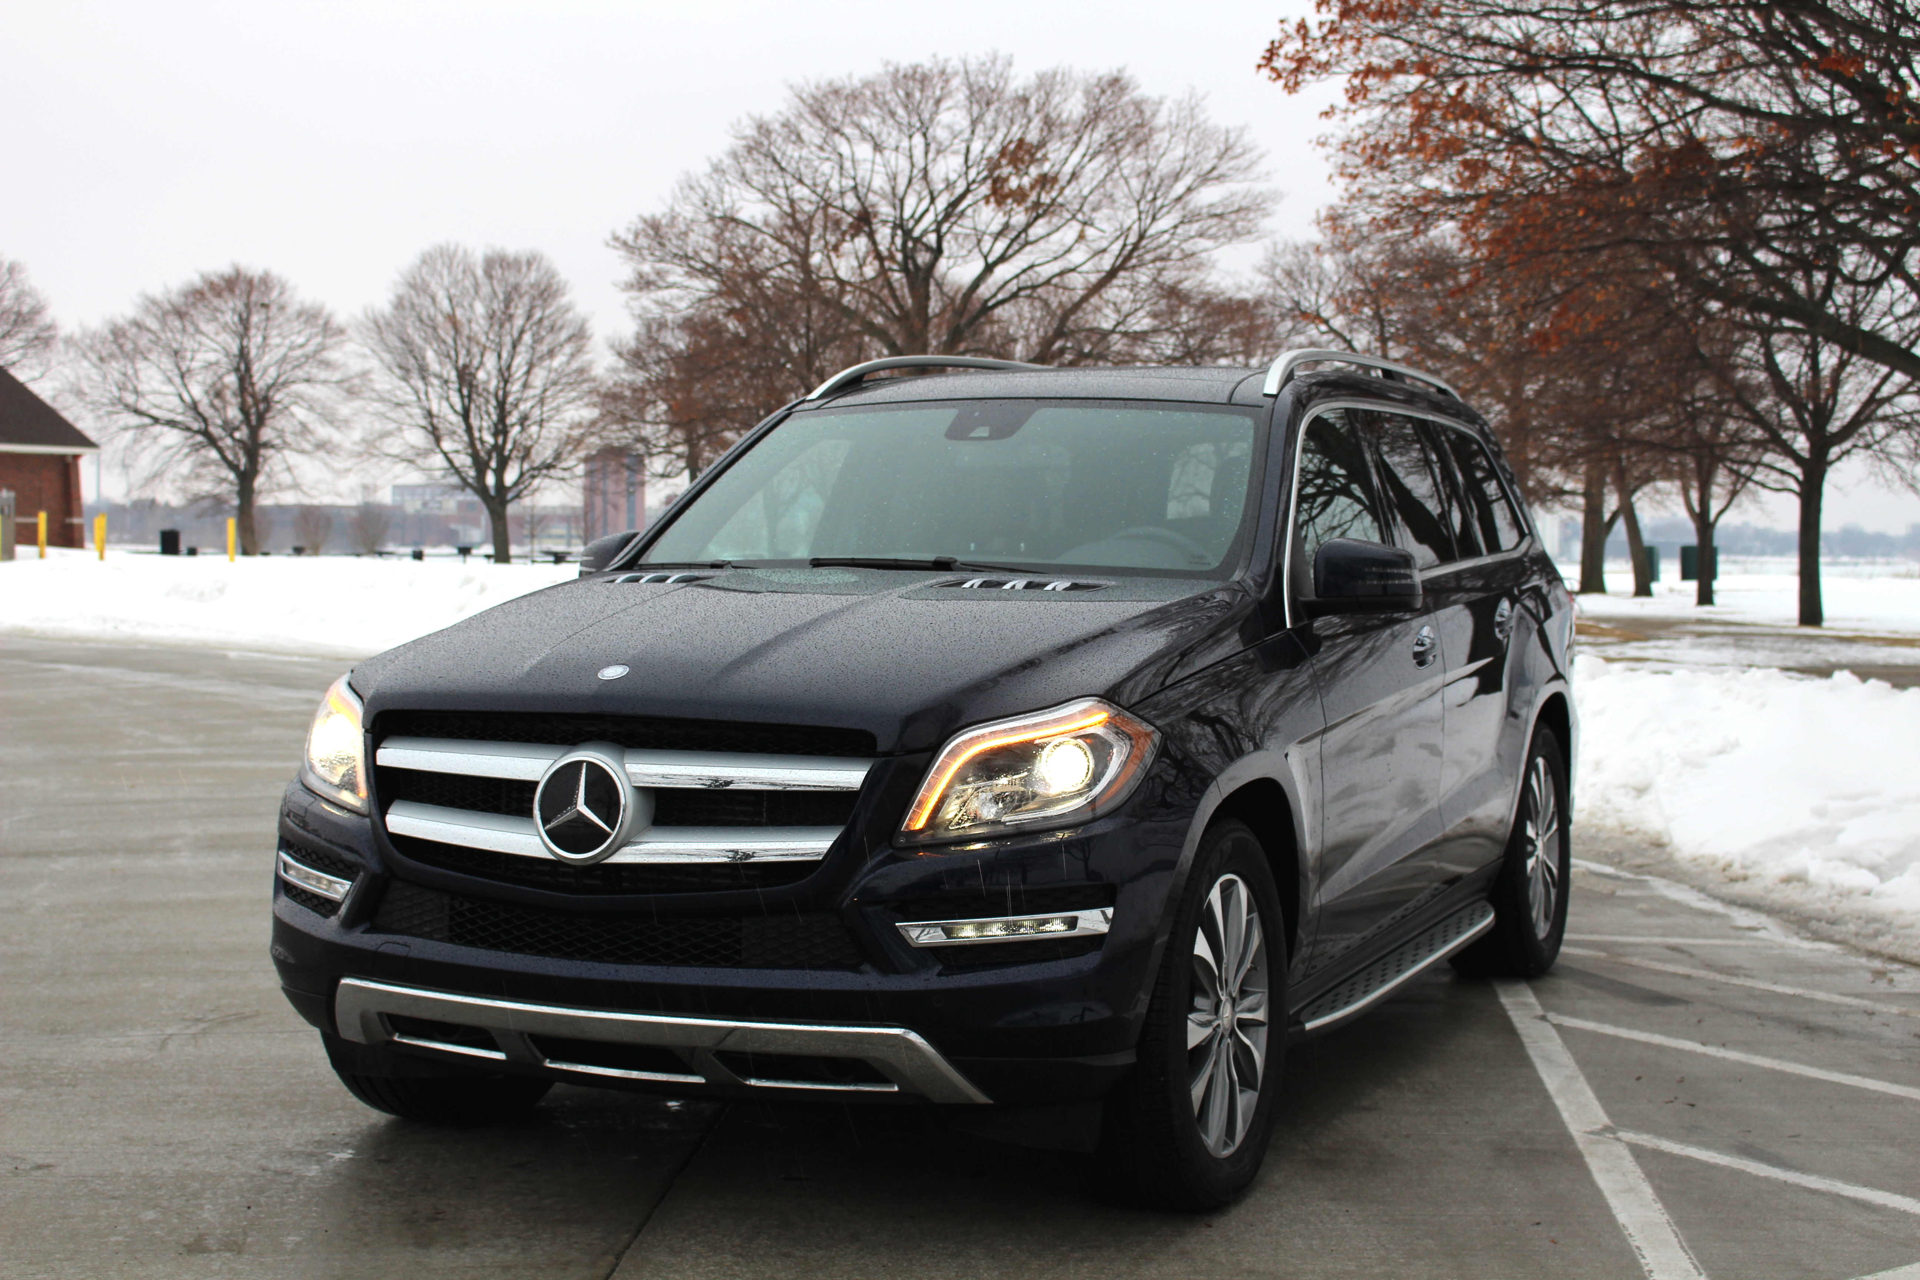 2015 Mercedes Benz Gl350 Bluetec 4matic Premium Diesel